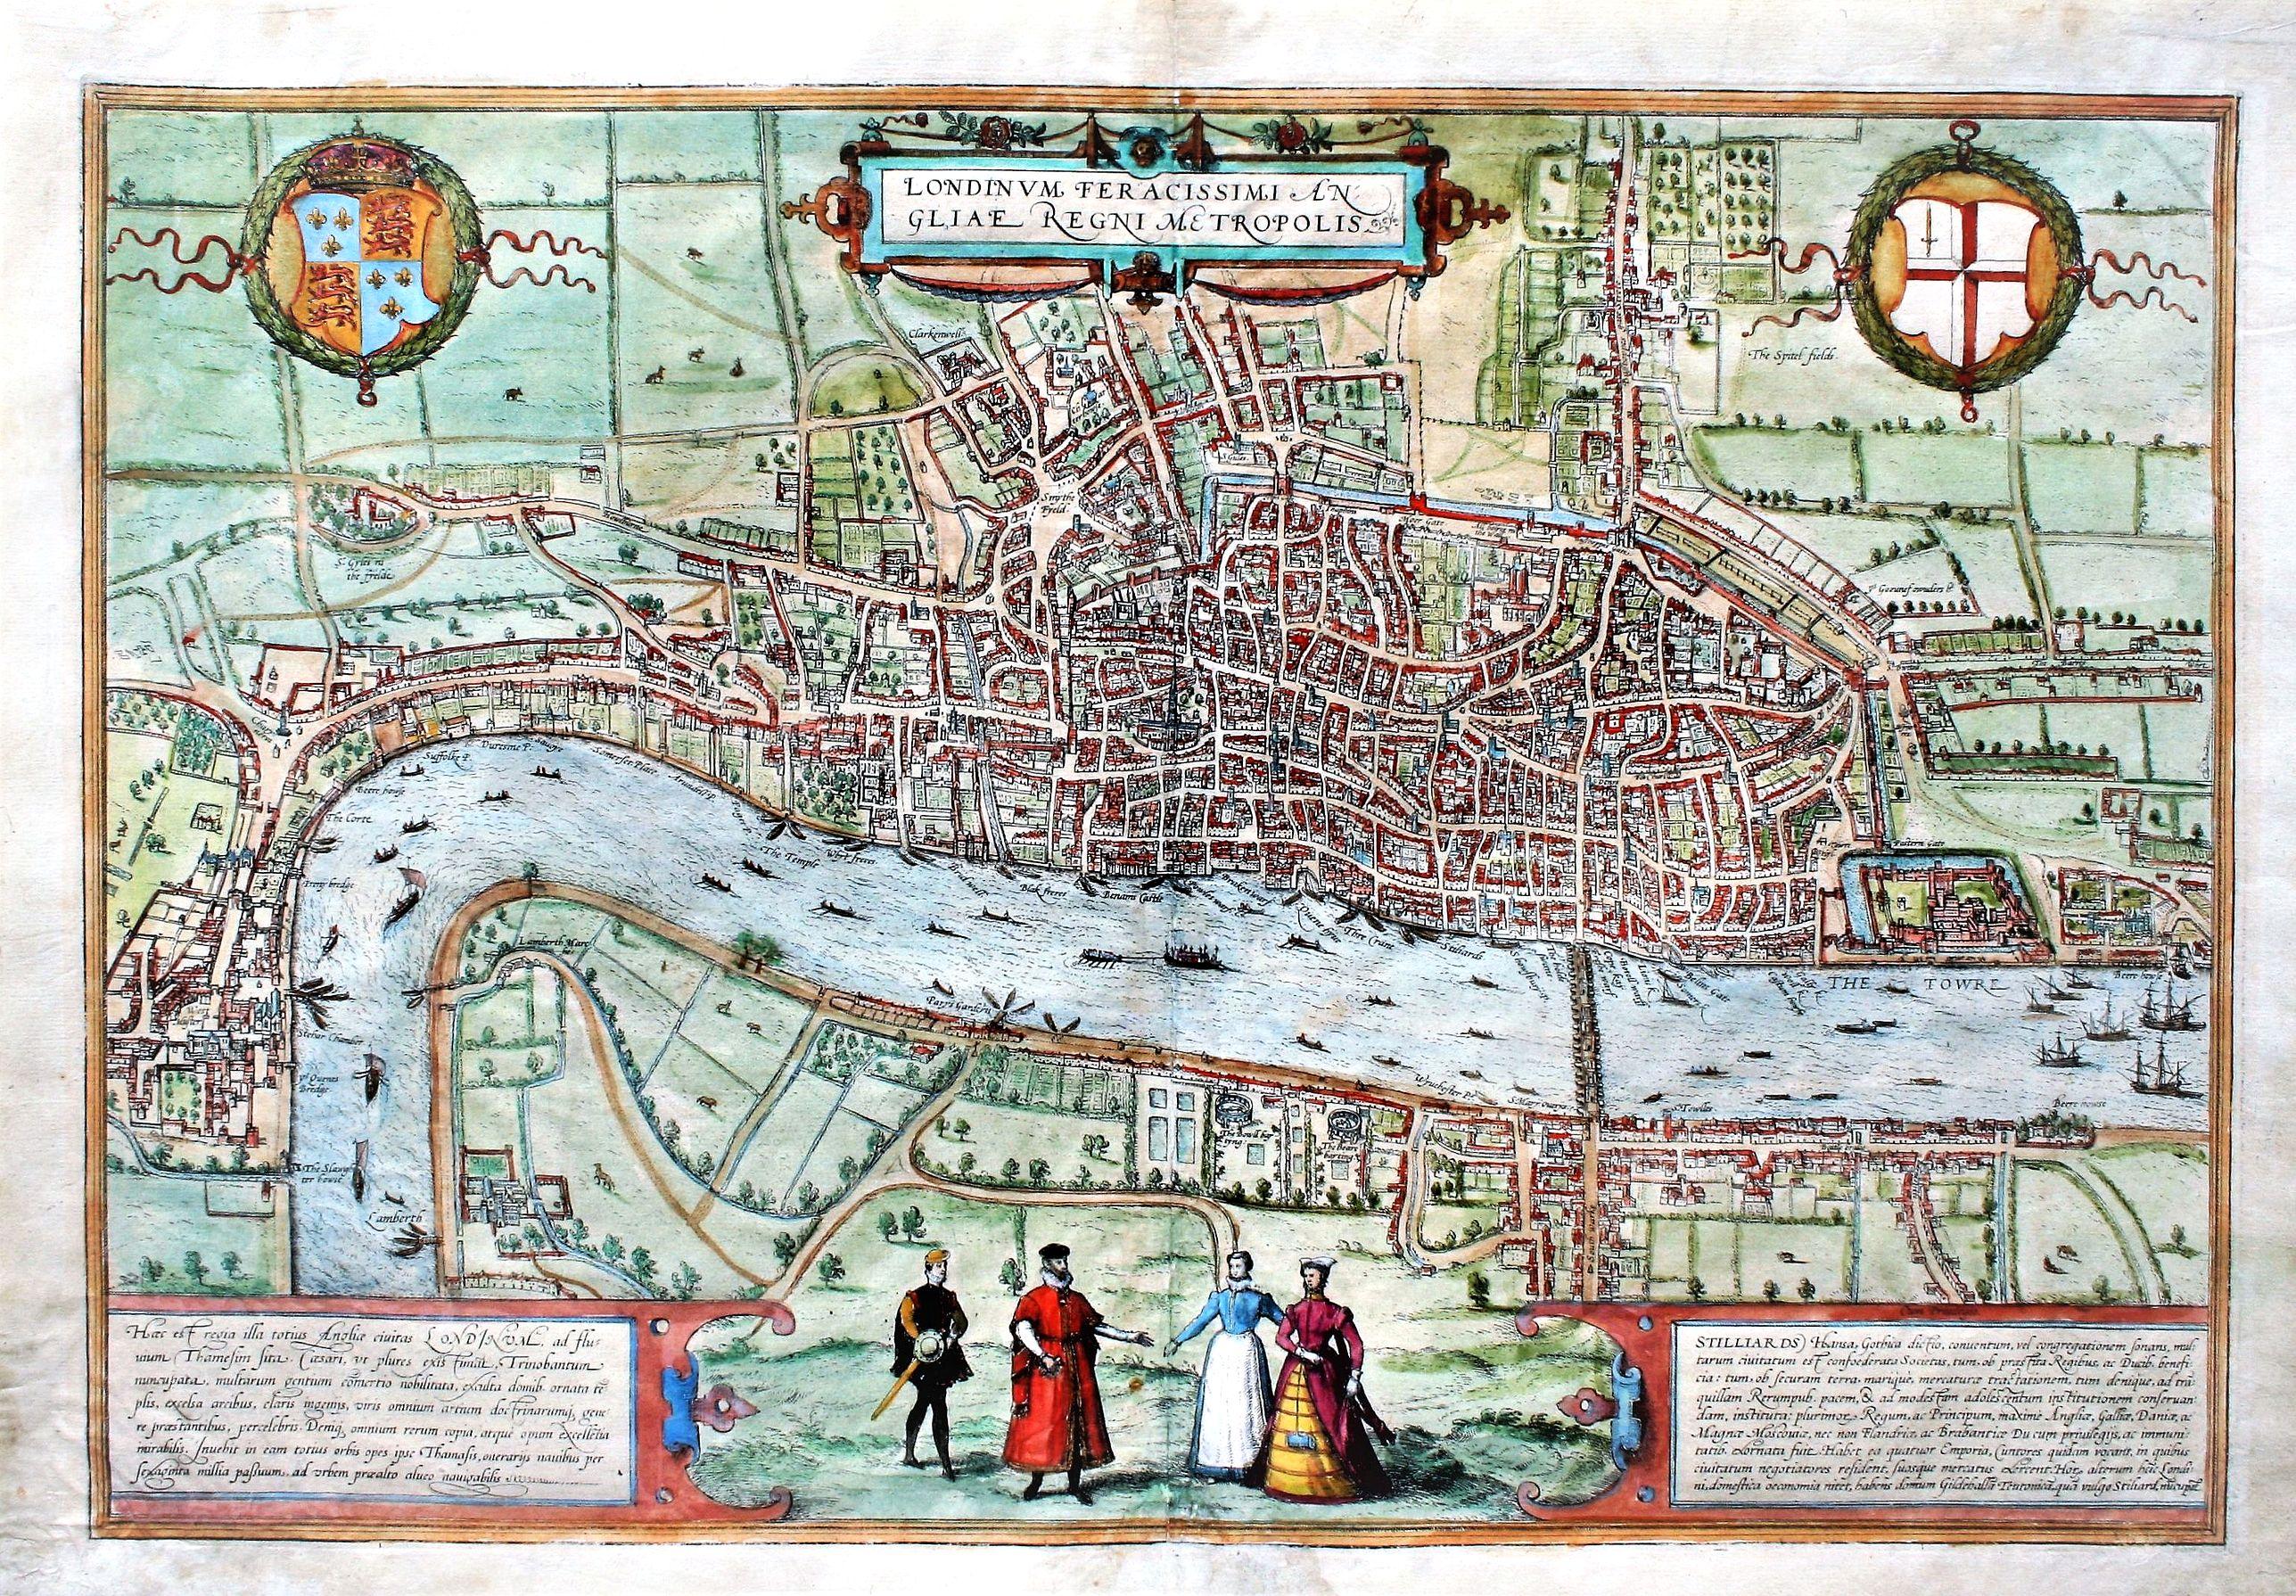 BRAUN, G. / HOGENBERG, F. - Londinum Feracissimi Angliae Regni Metropolis.